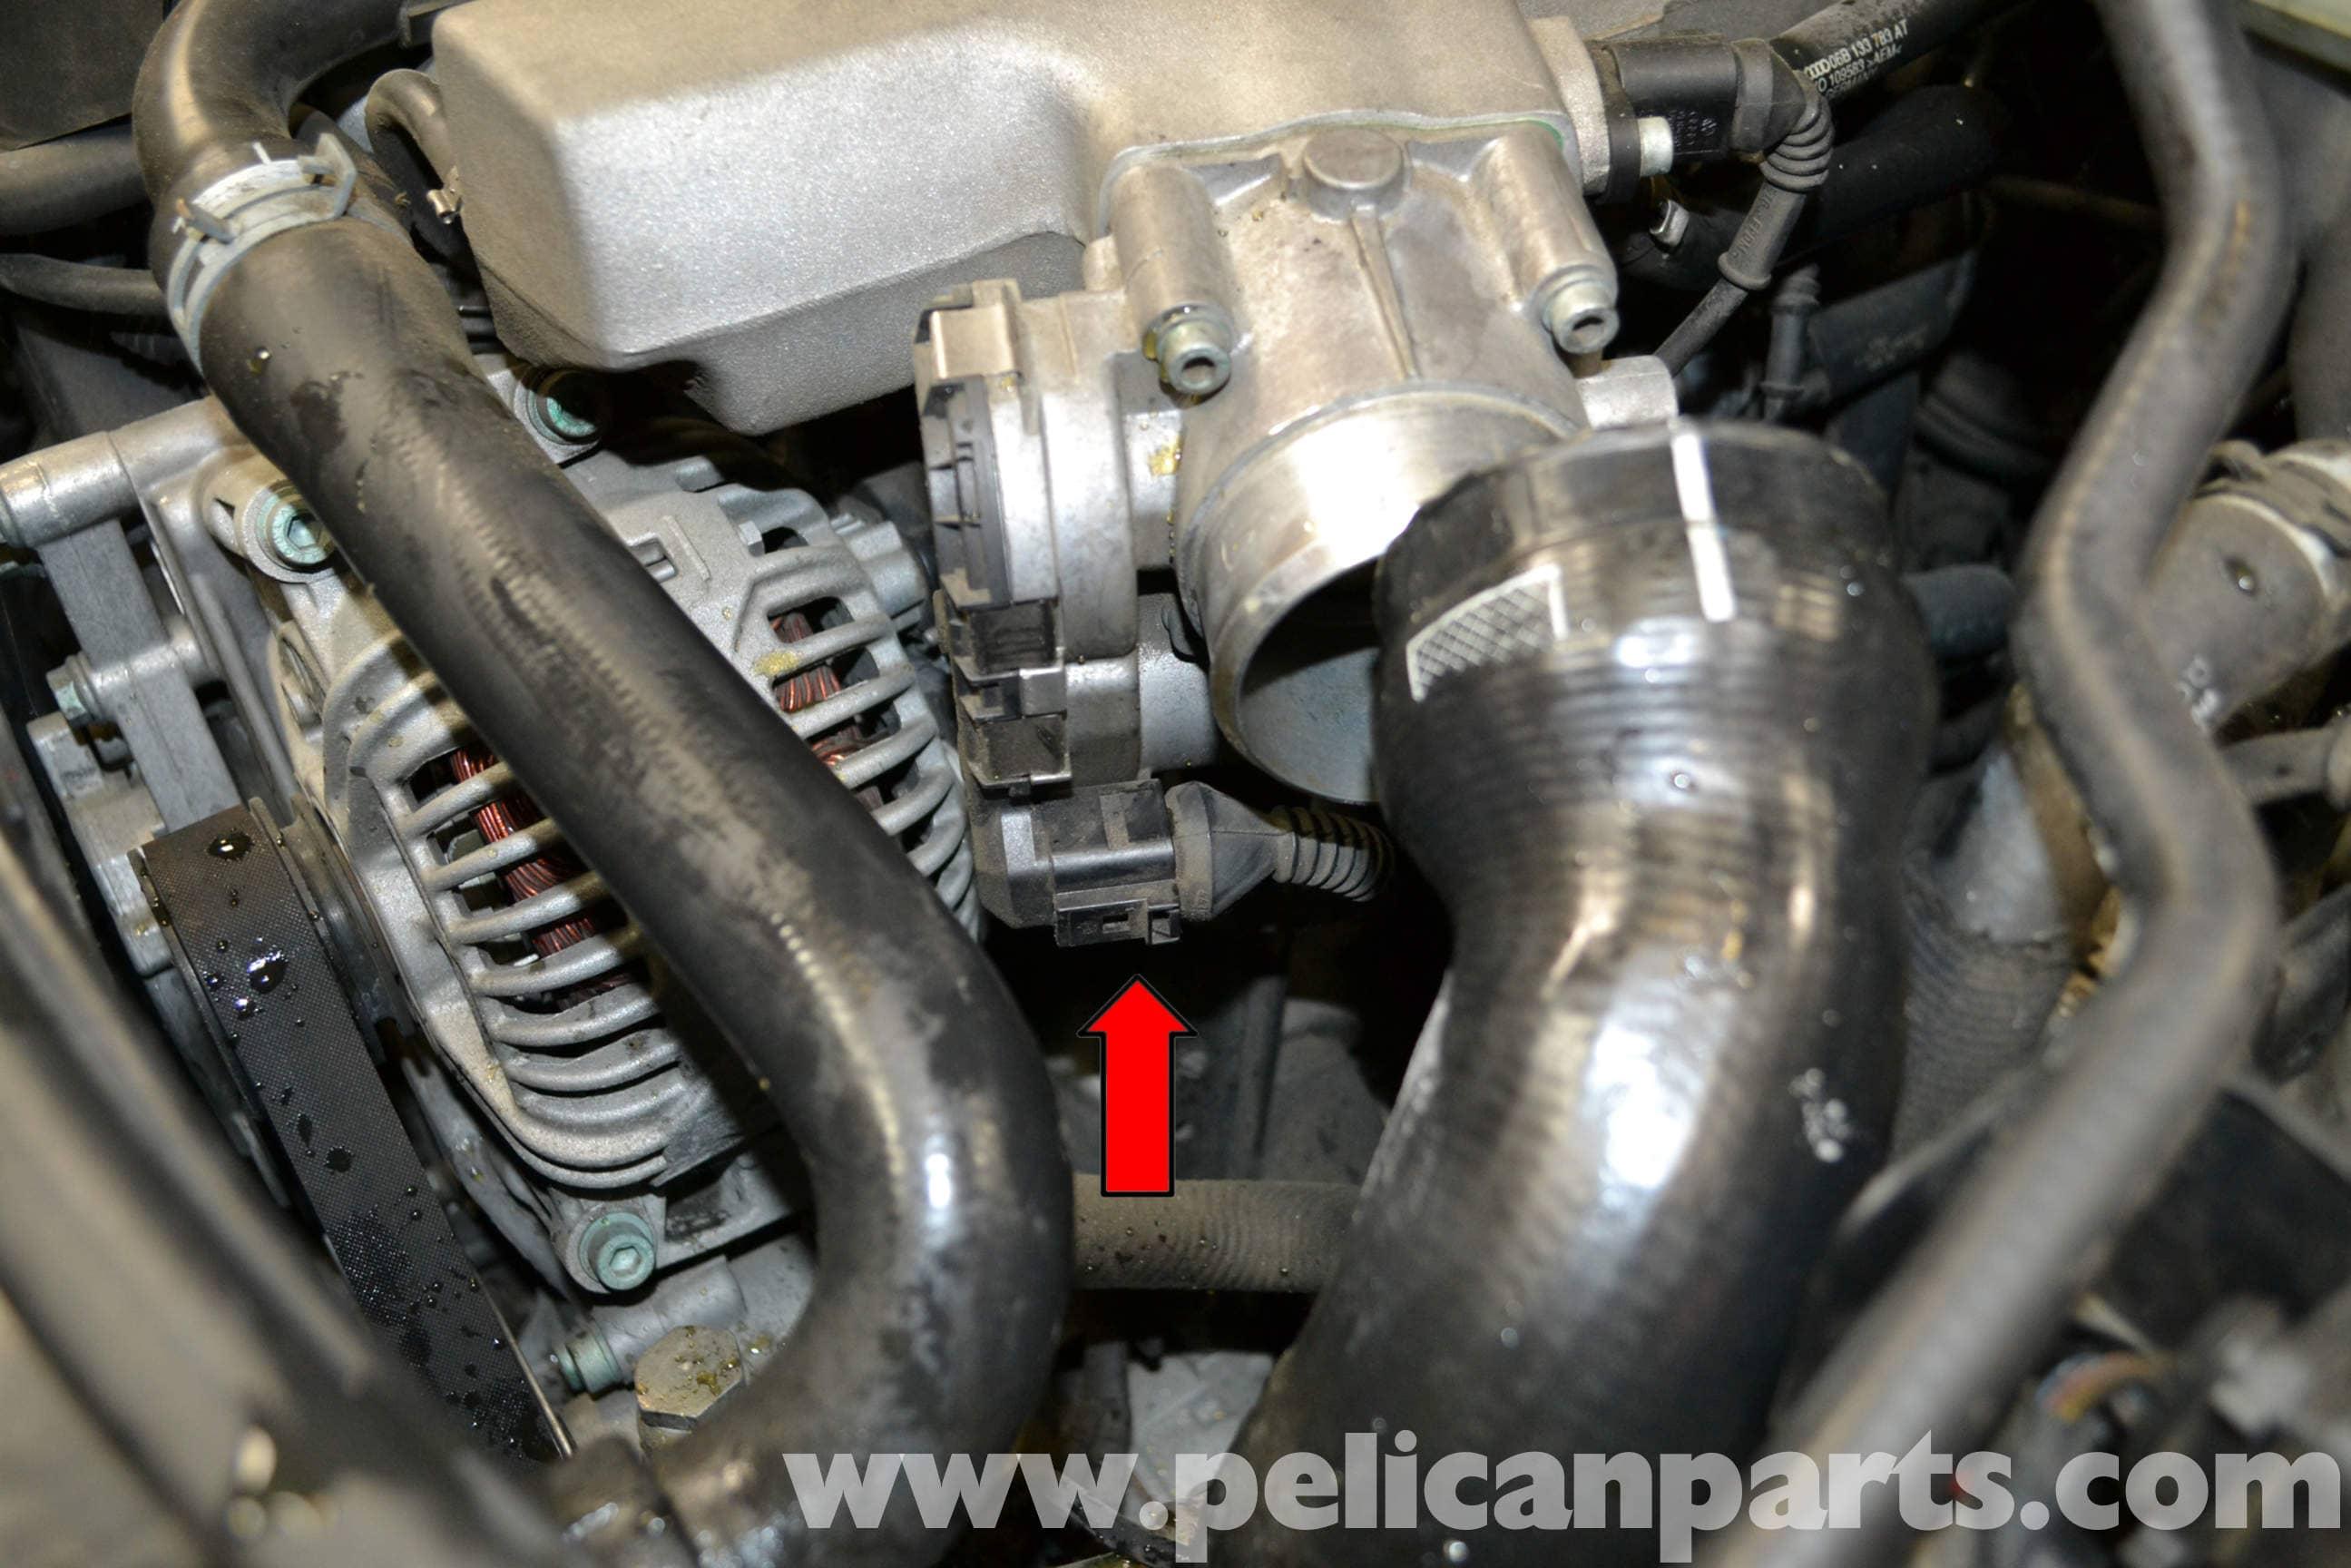 audi a4 b6 throttle body cleaning 2002 2008 pelican parts diy rh pelicanparts com Audi A4 Service Manual Bentley 2001 Audi A4 1.8T Interior